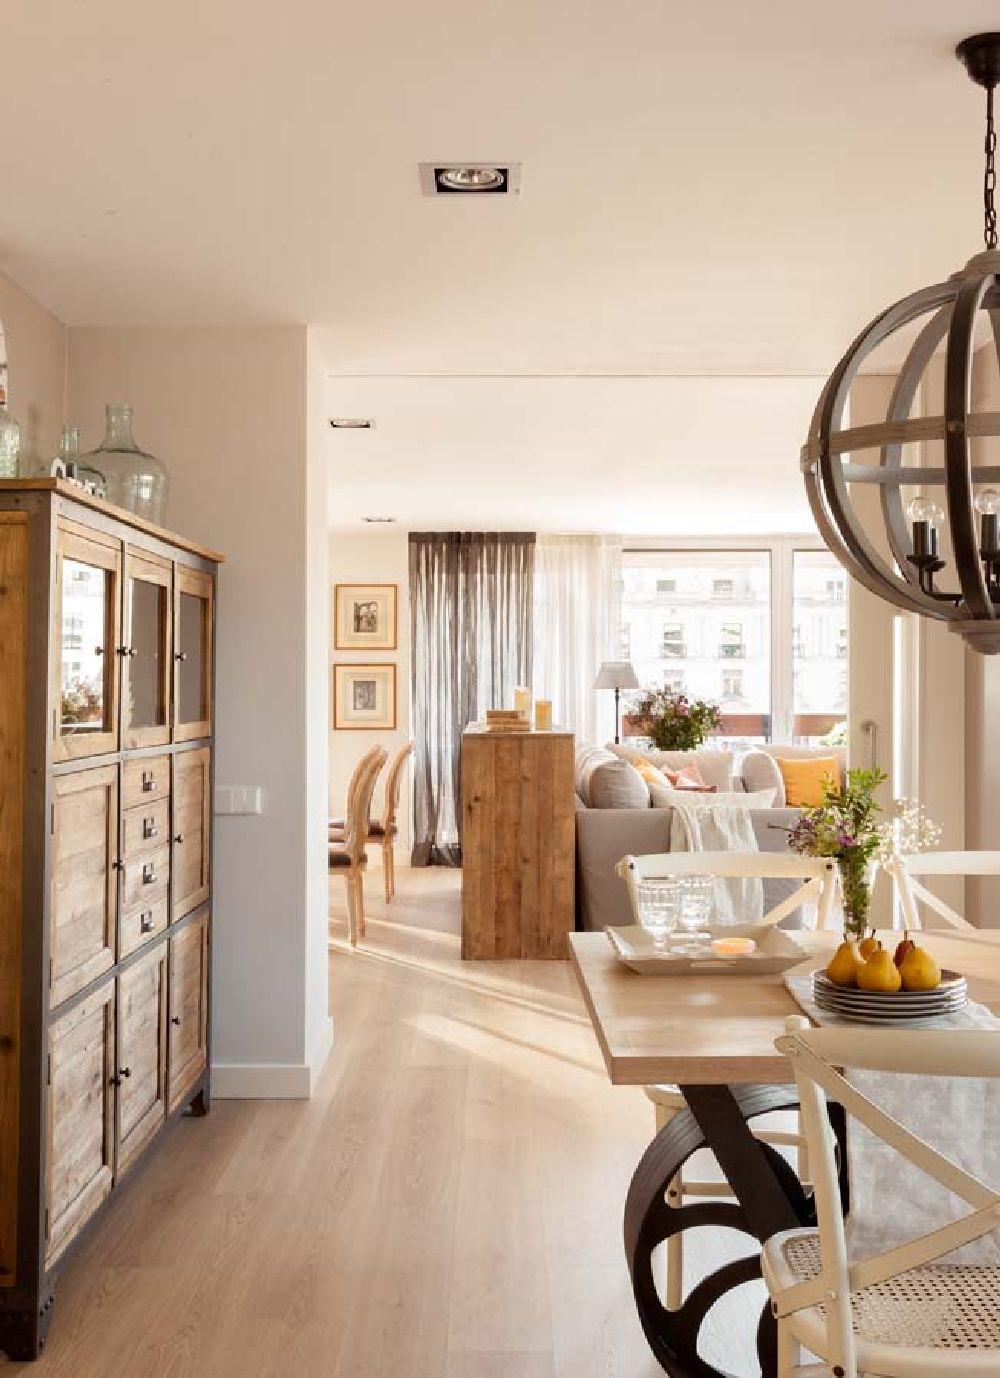 adelaparvu.com despre apartament cu camere separate de usi glisante, designer Pia Capdevila, Foto ElMueble (2)